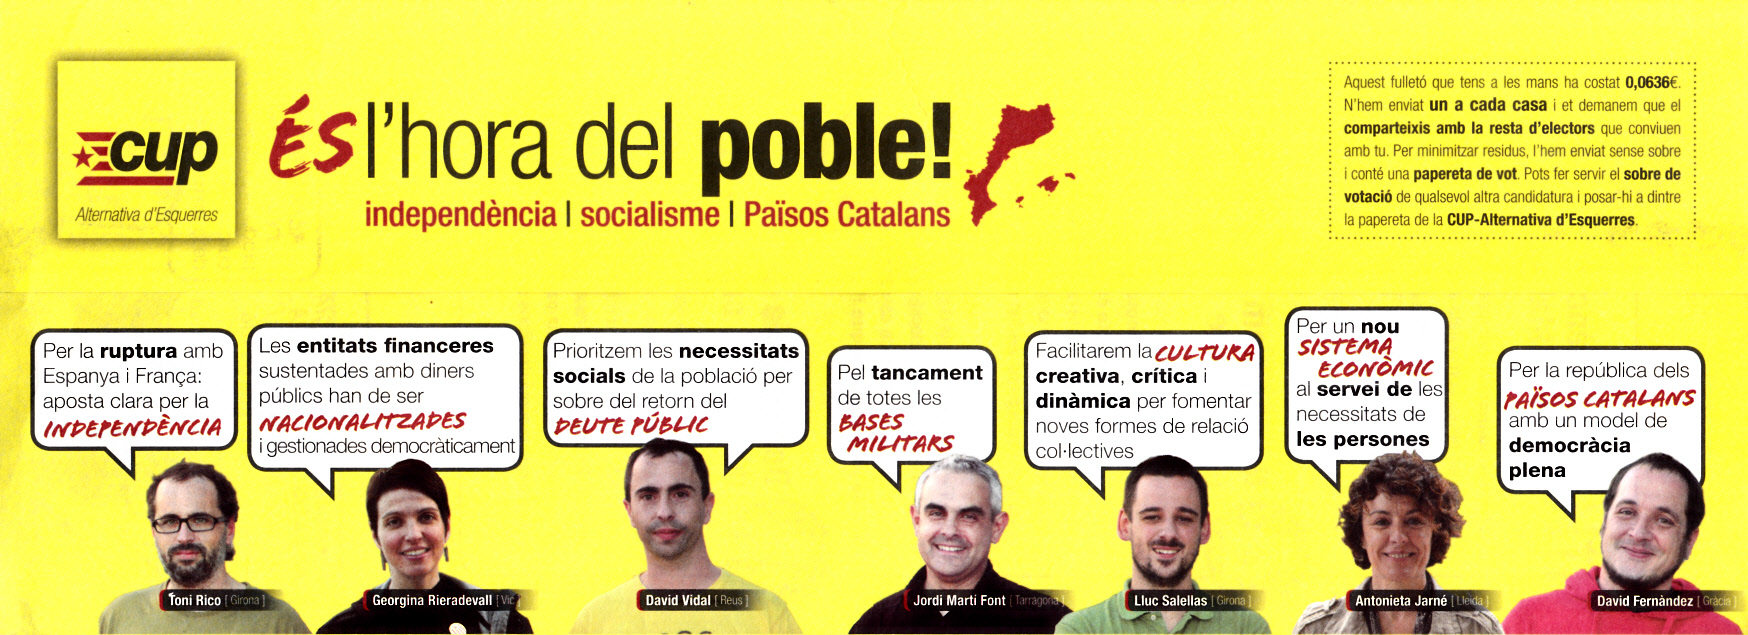 _Cup_barcelona_2012_0002